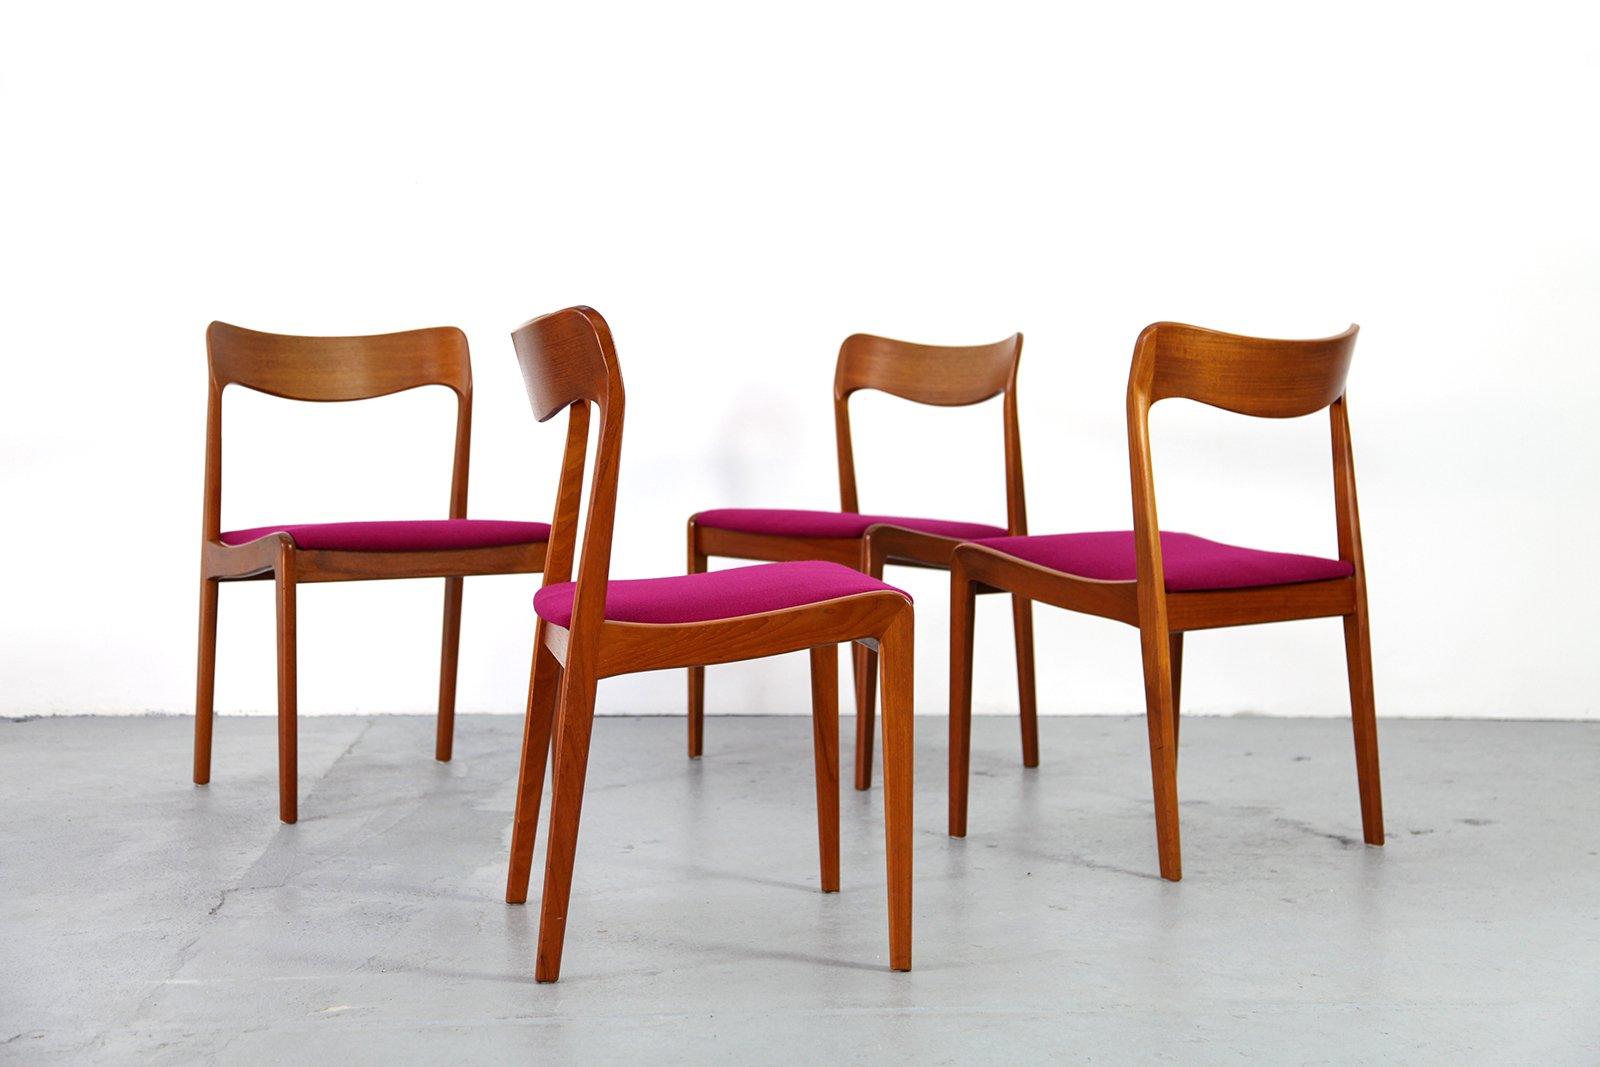 danish teak chairs 1960s set of 4 for sale at pamono